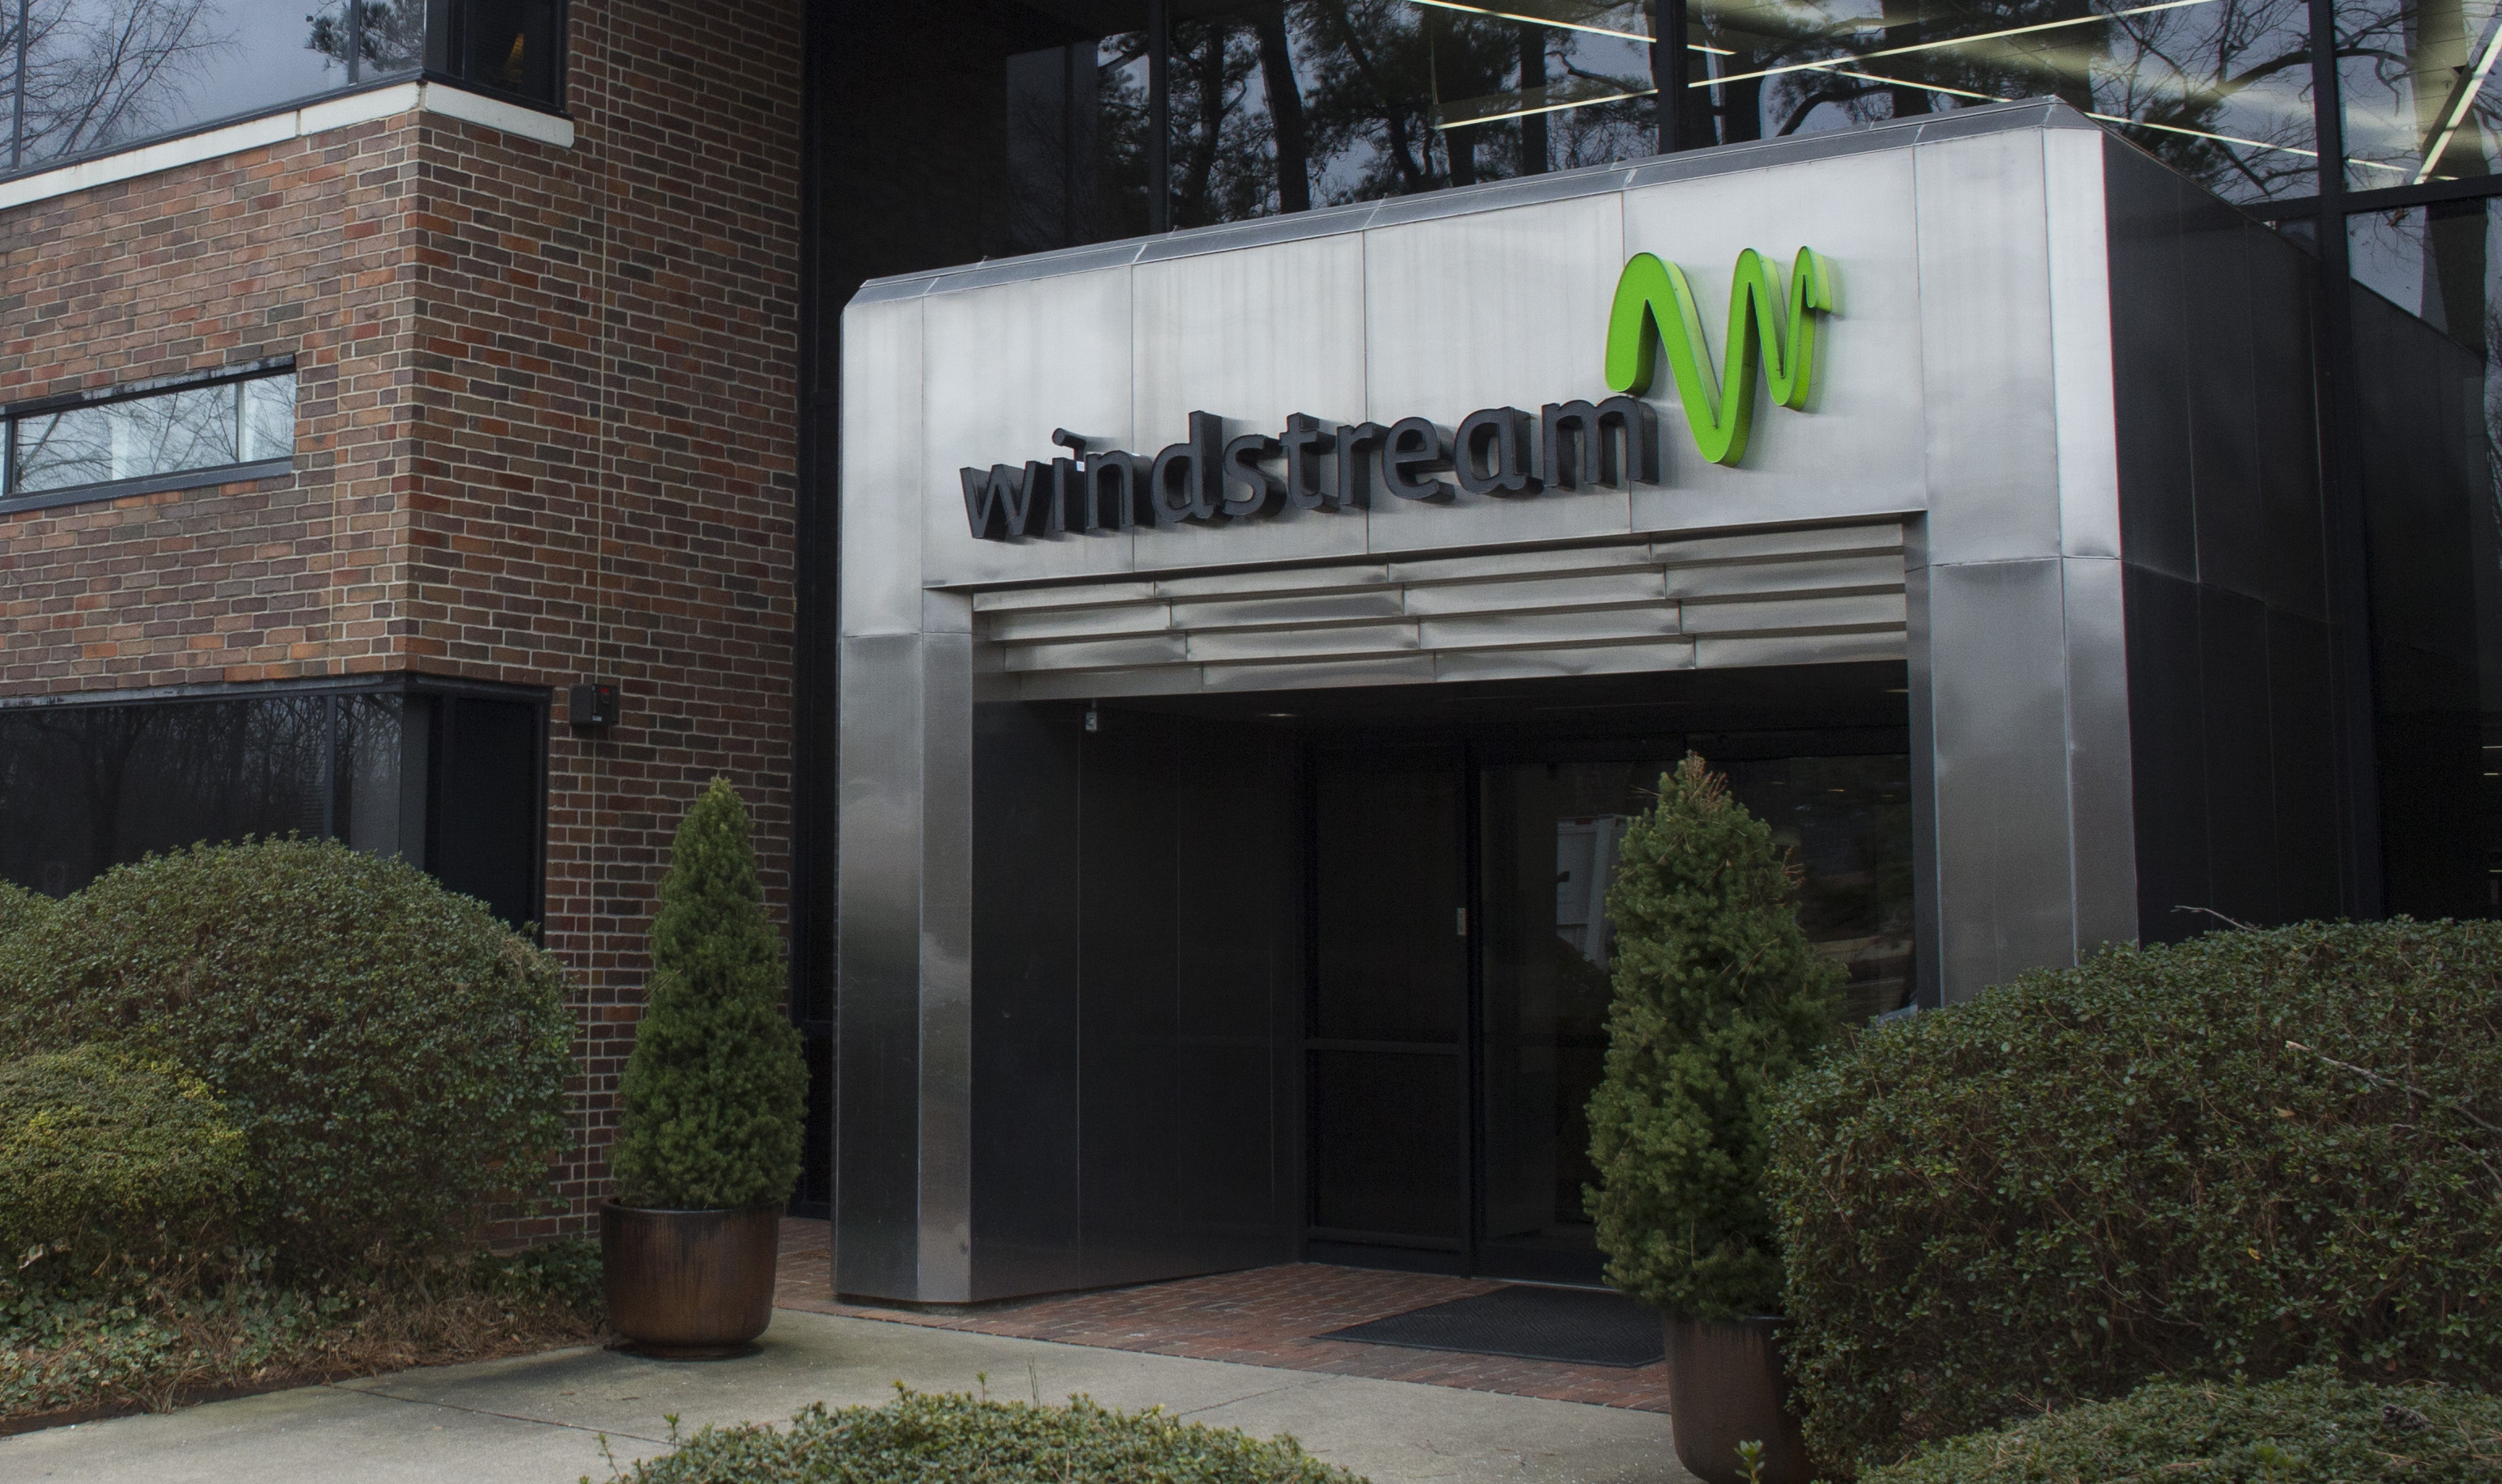 Windstream's net loss in quarter hits $2 3B